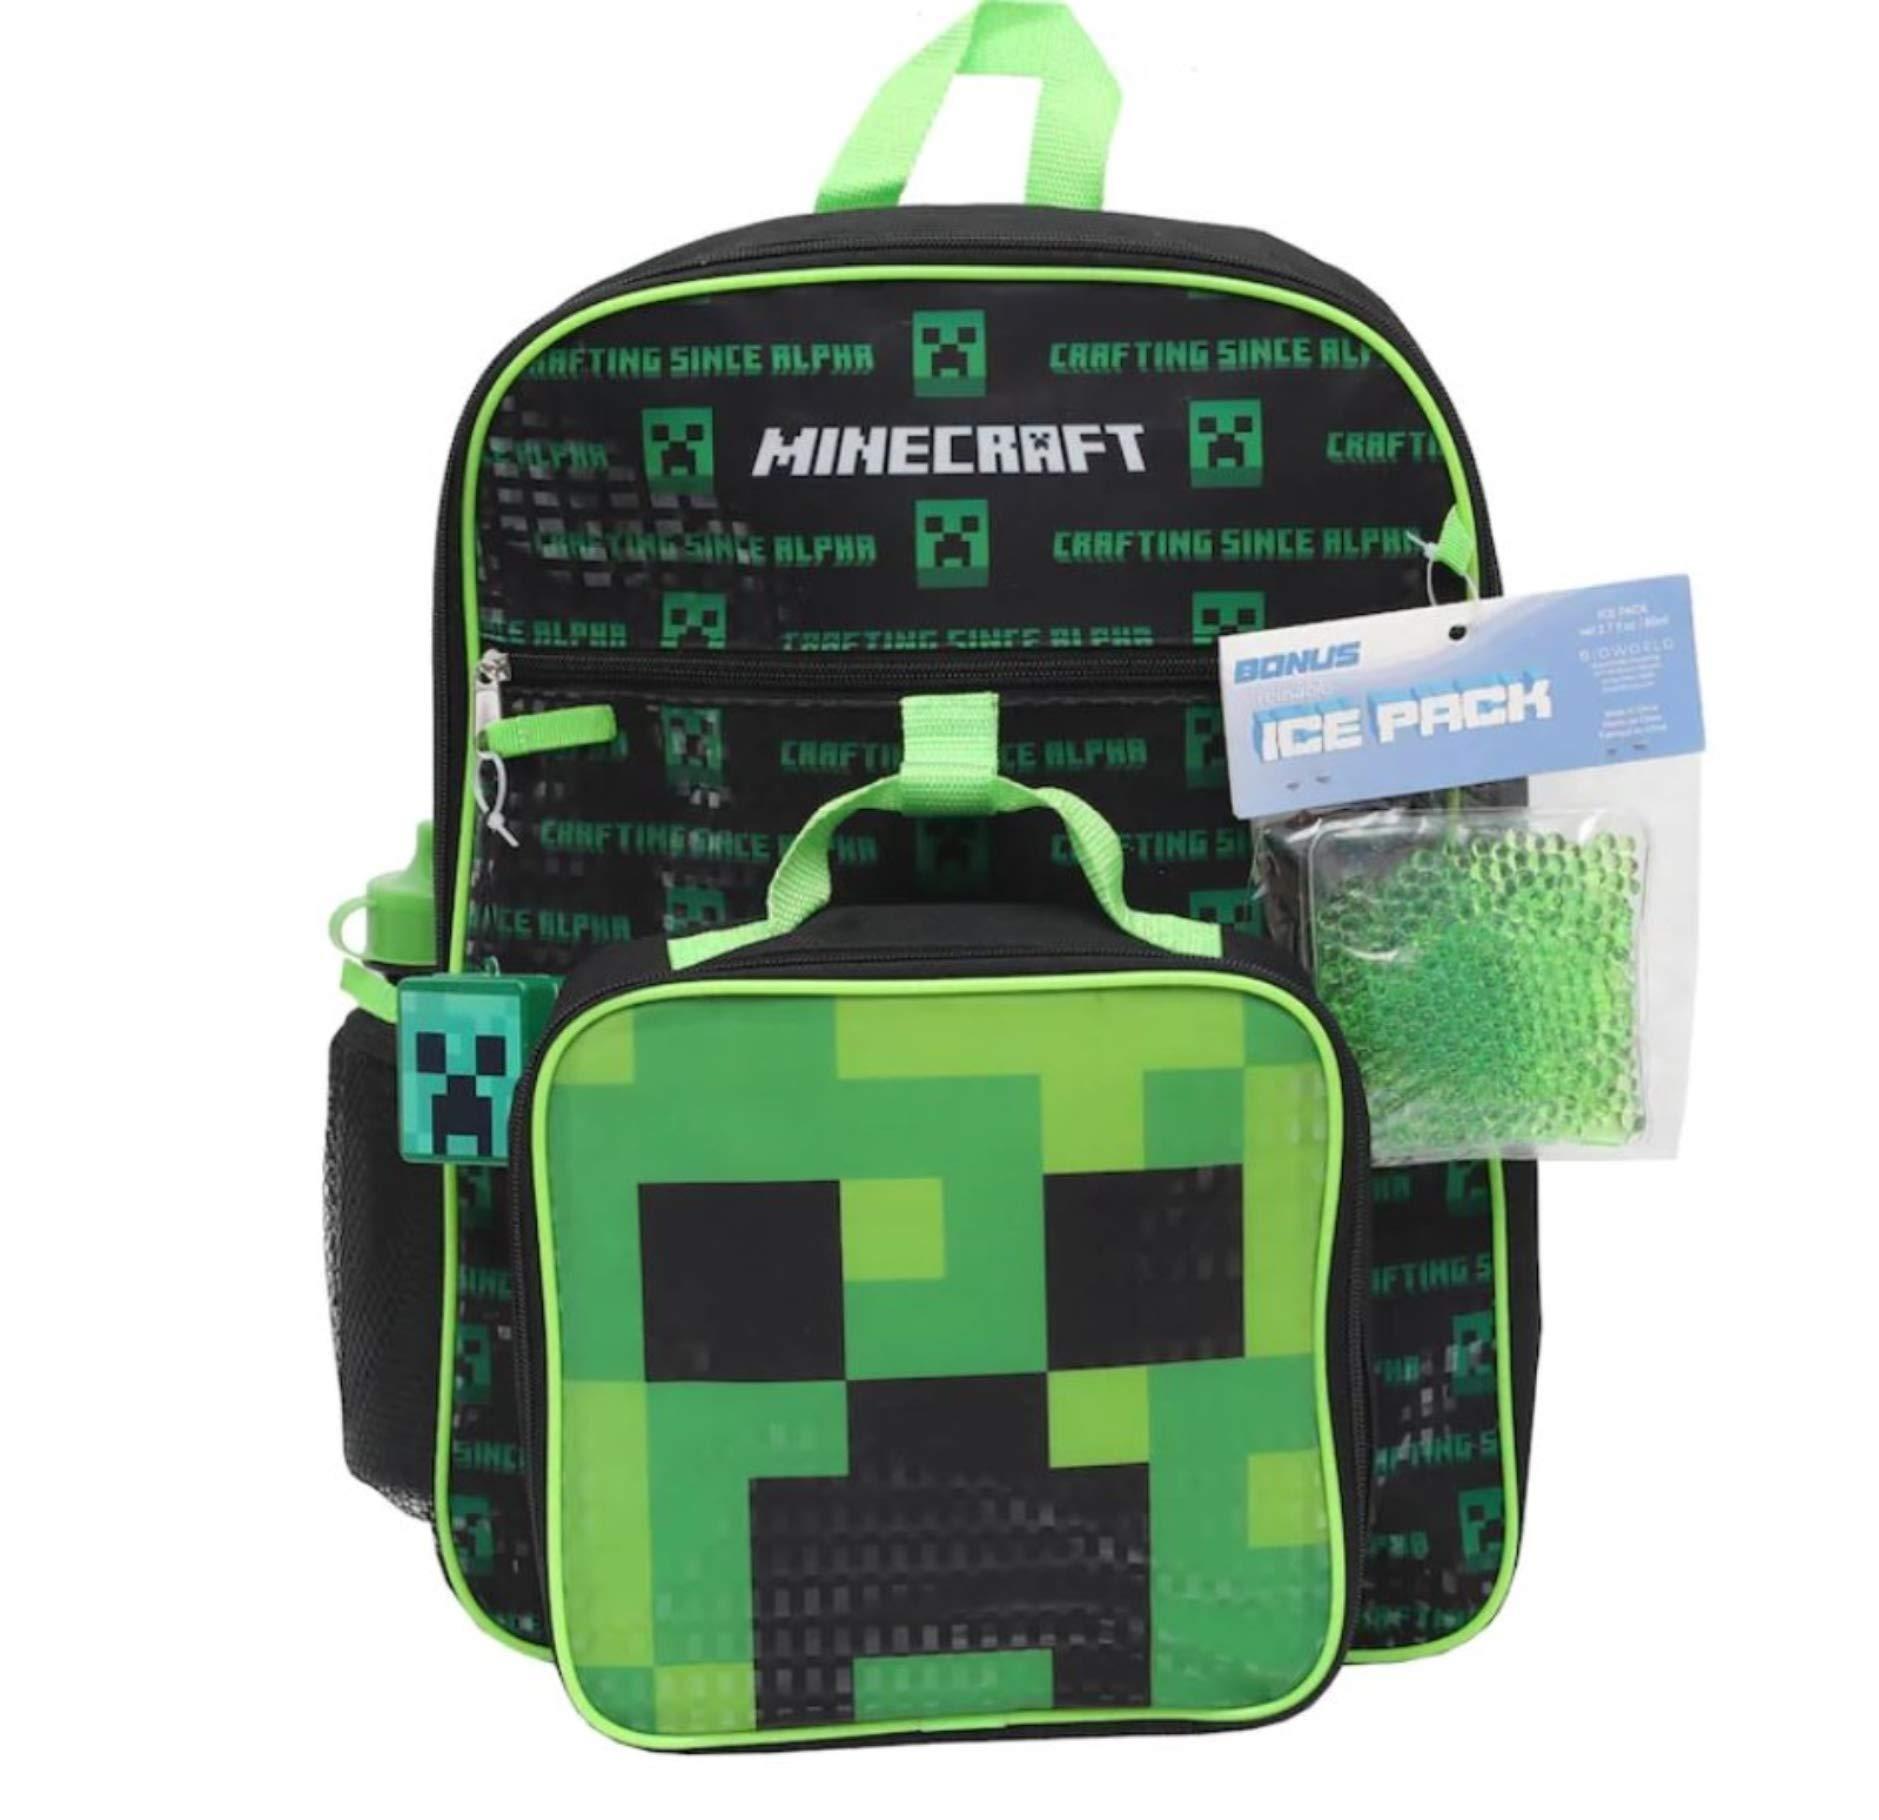 Minecraft 5-Piece Backpack Set